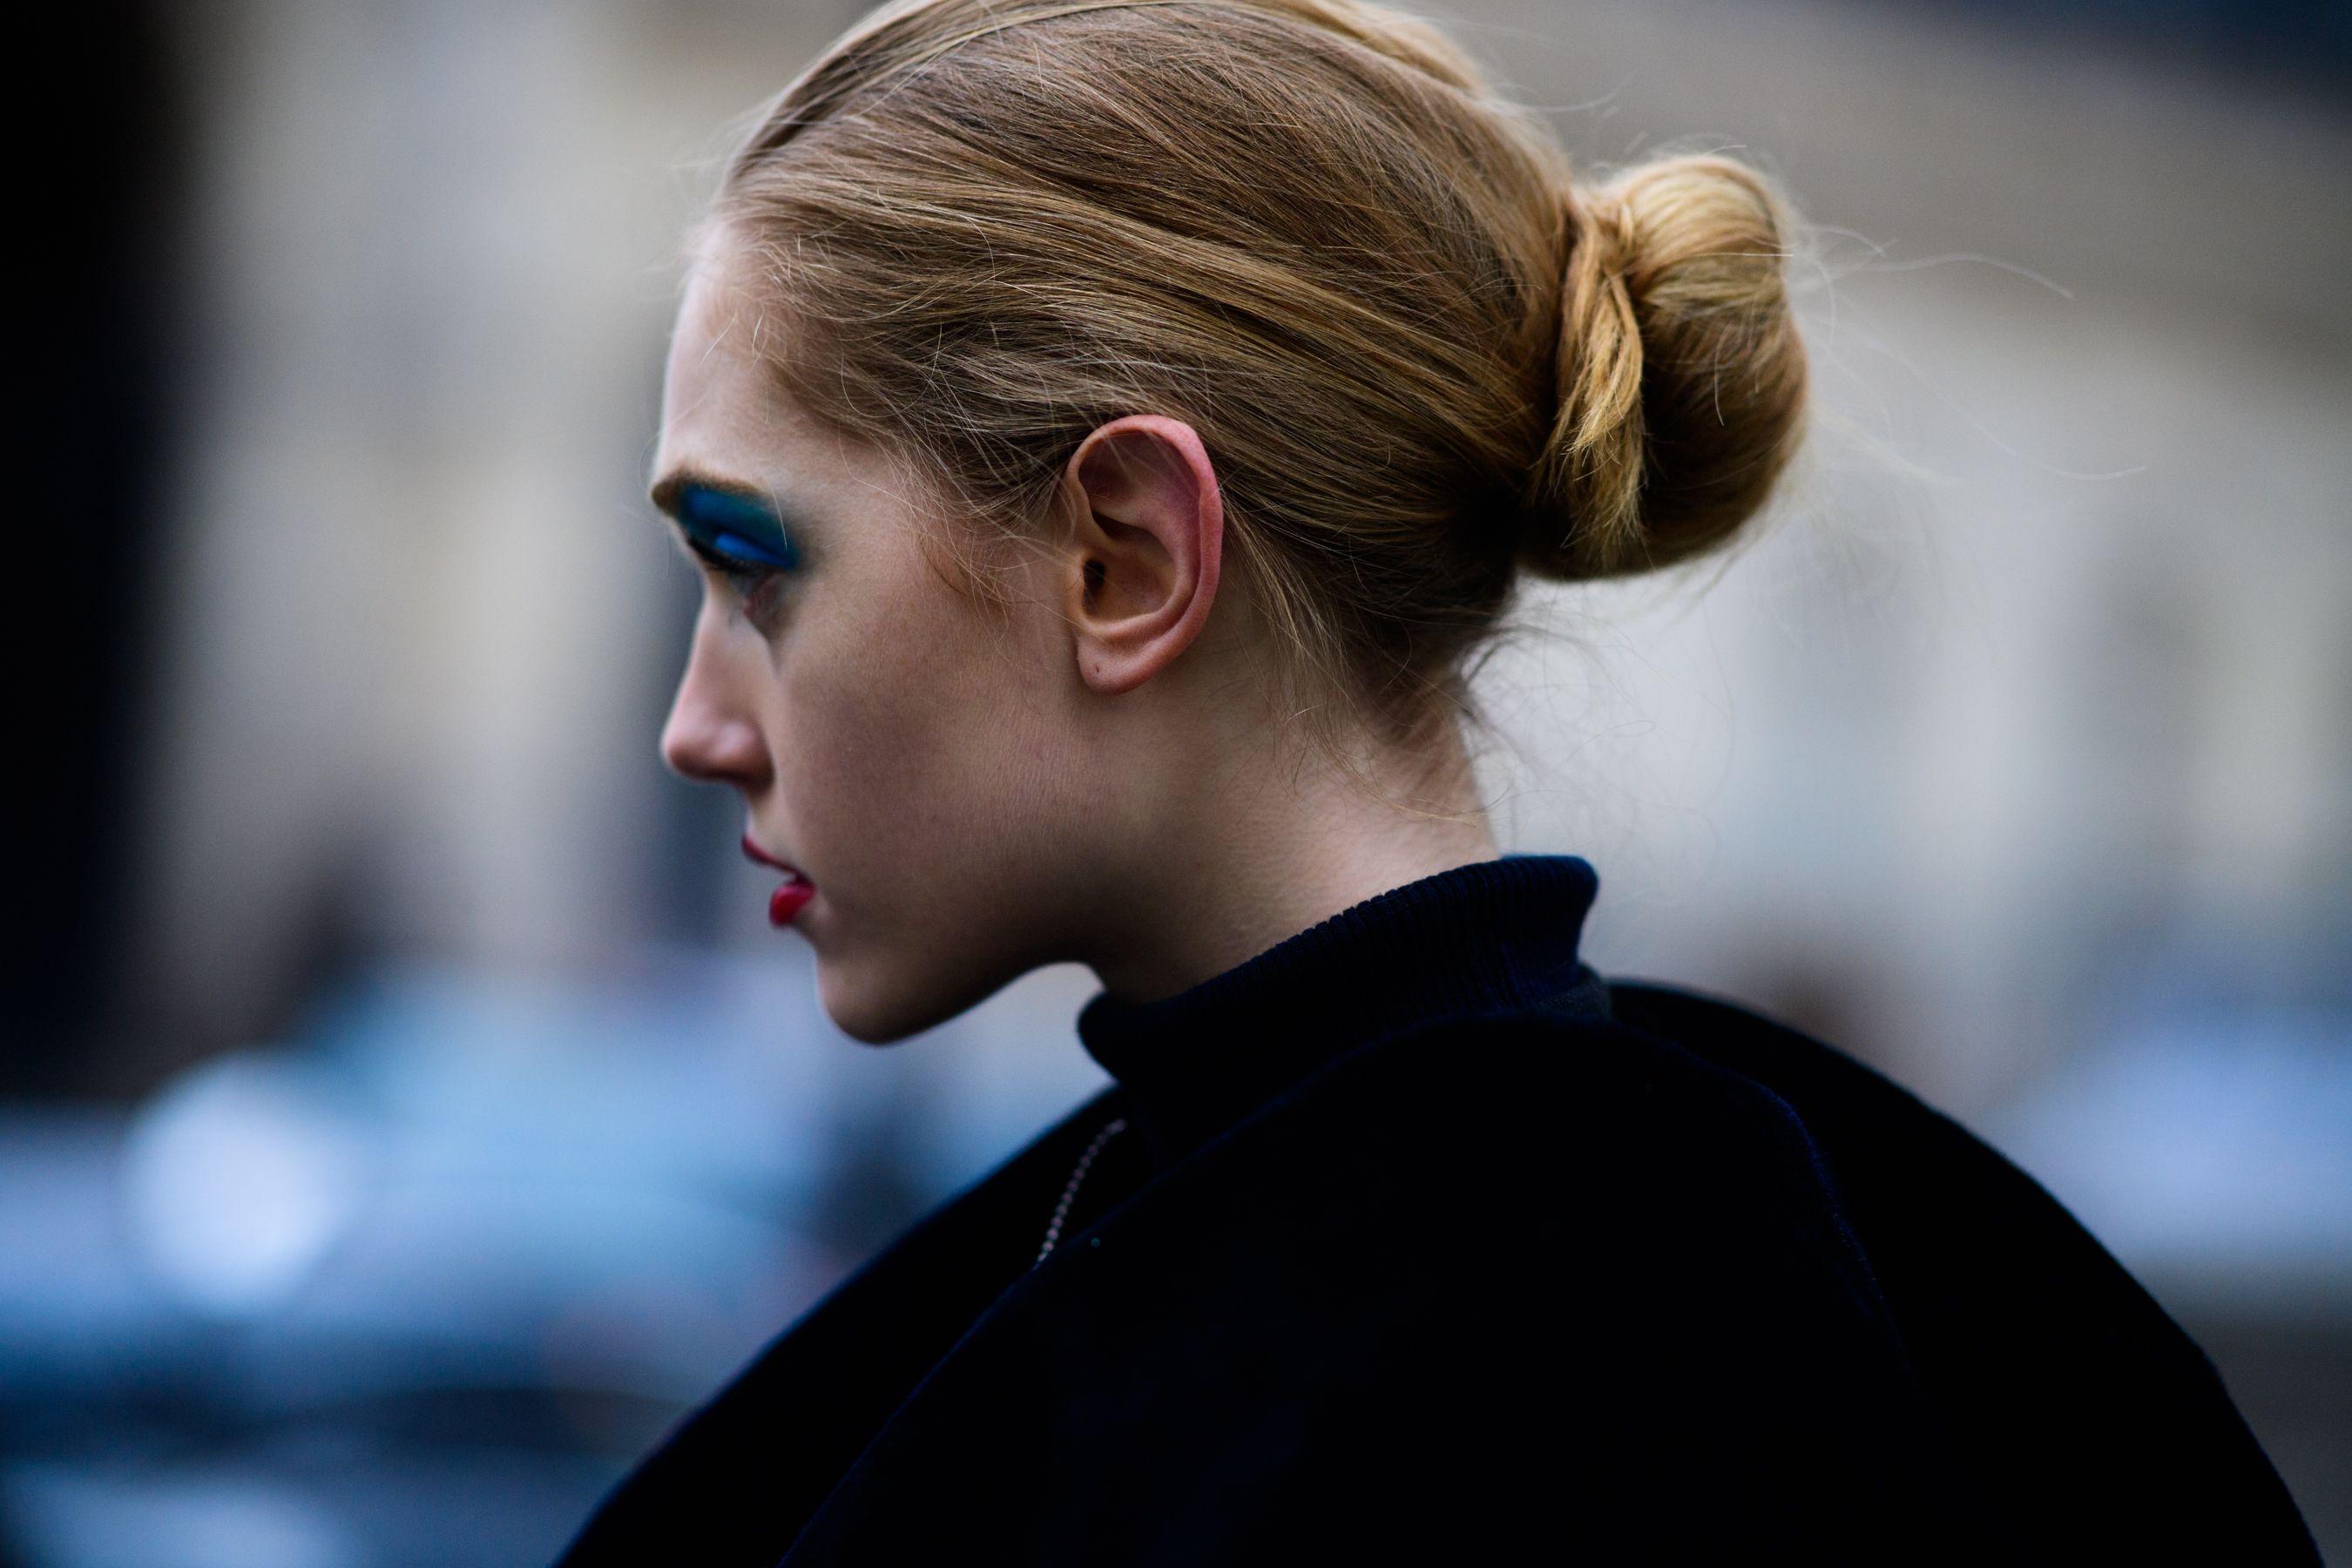 Elizabeth Moore | Paris